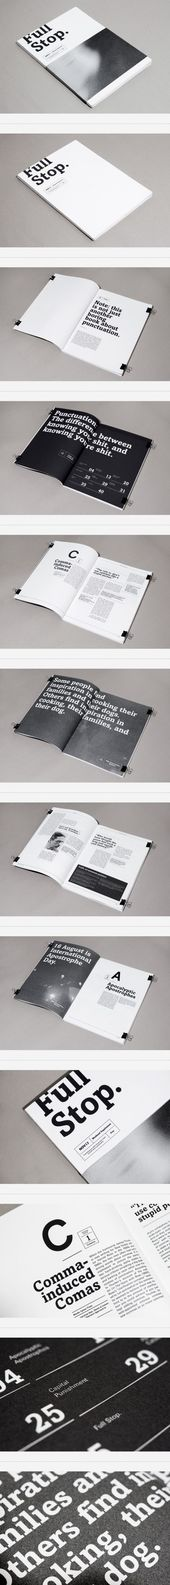 #bookandmagazinedesign #book #and #magazine #design   – Book And Magazine Design